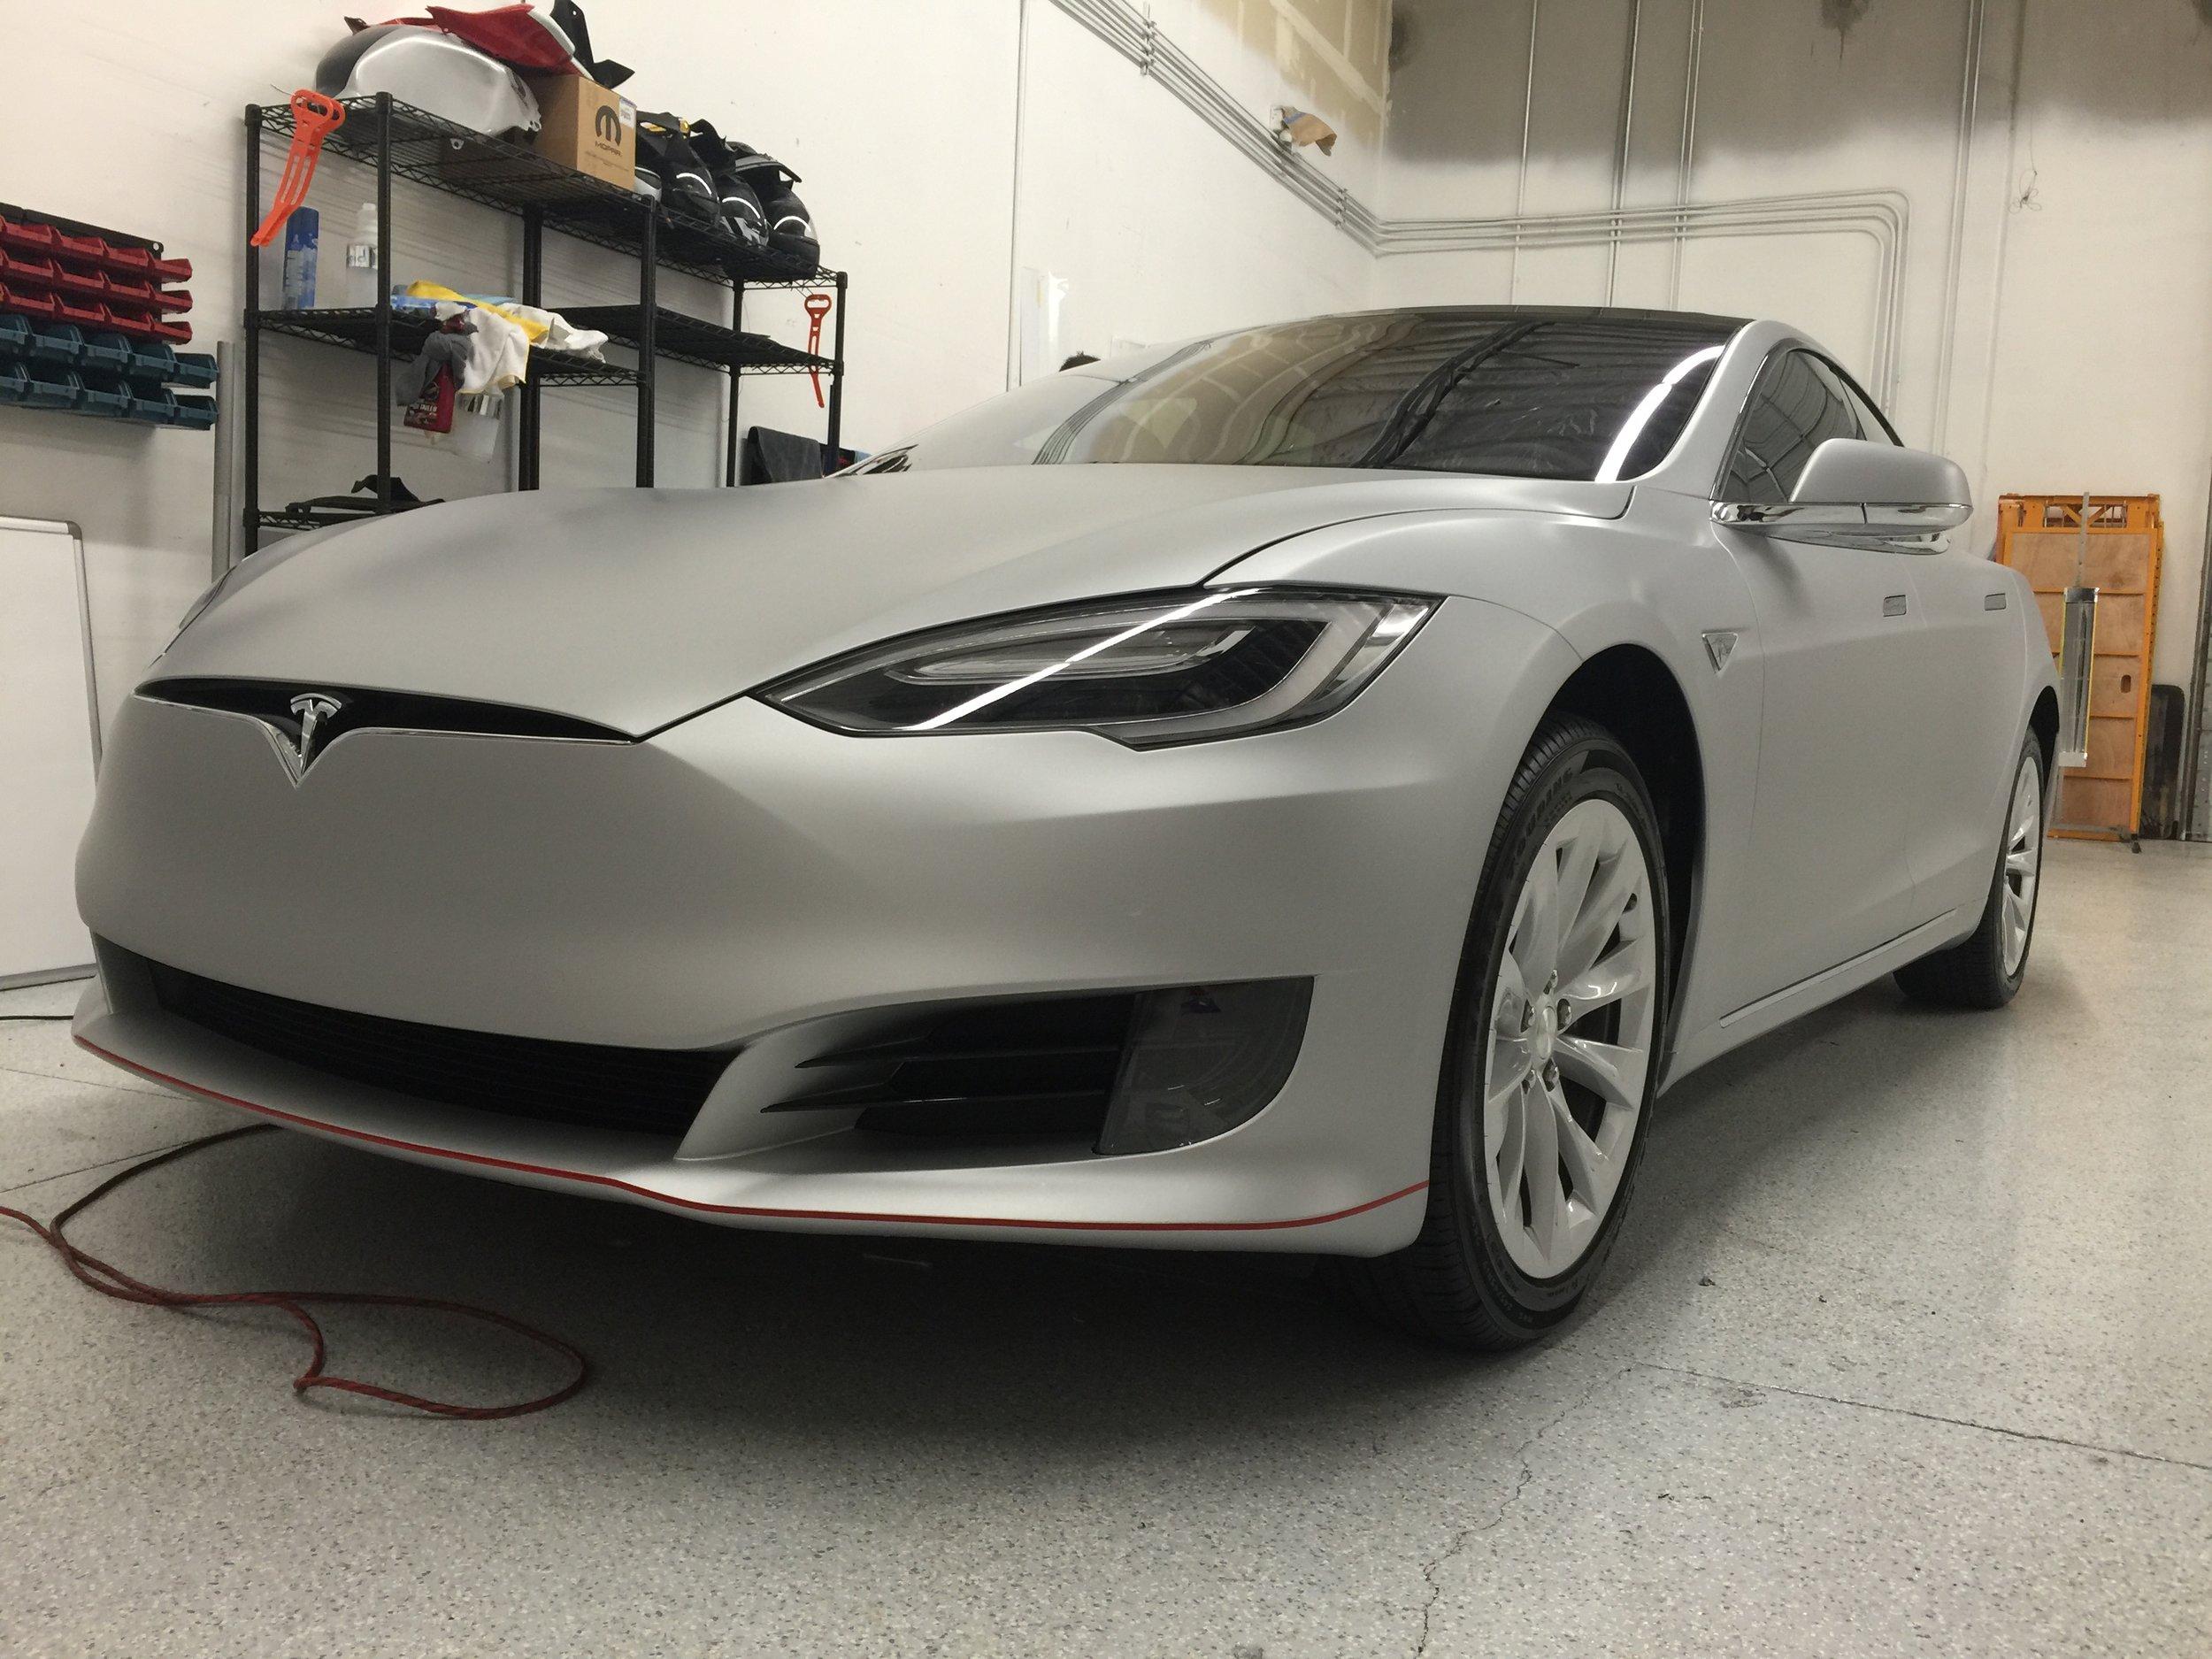 Tesla Model S Matte Metallic Silver